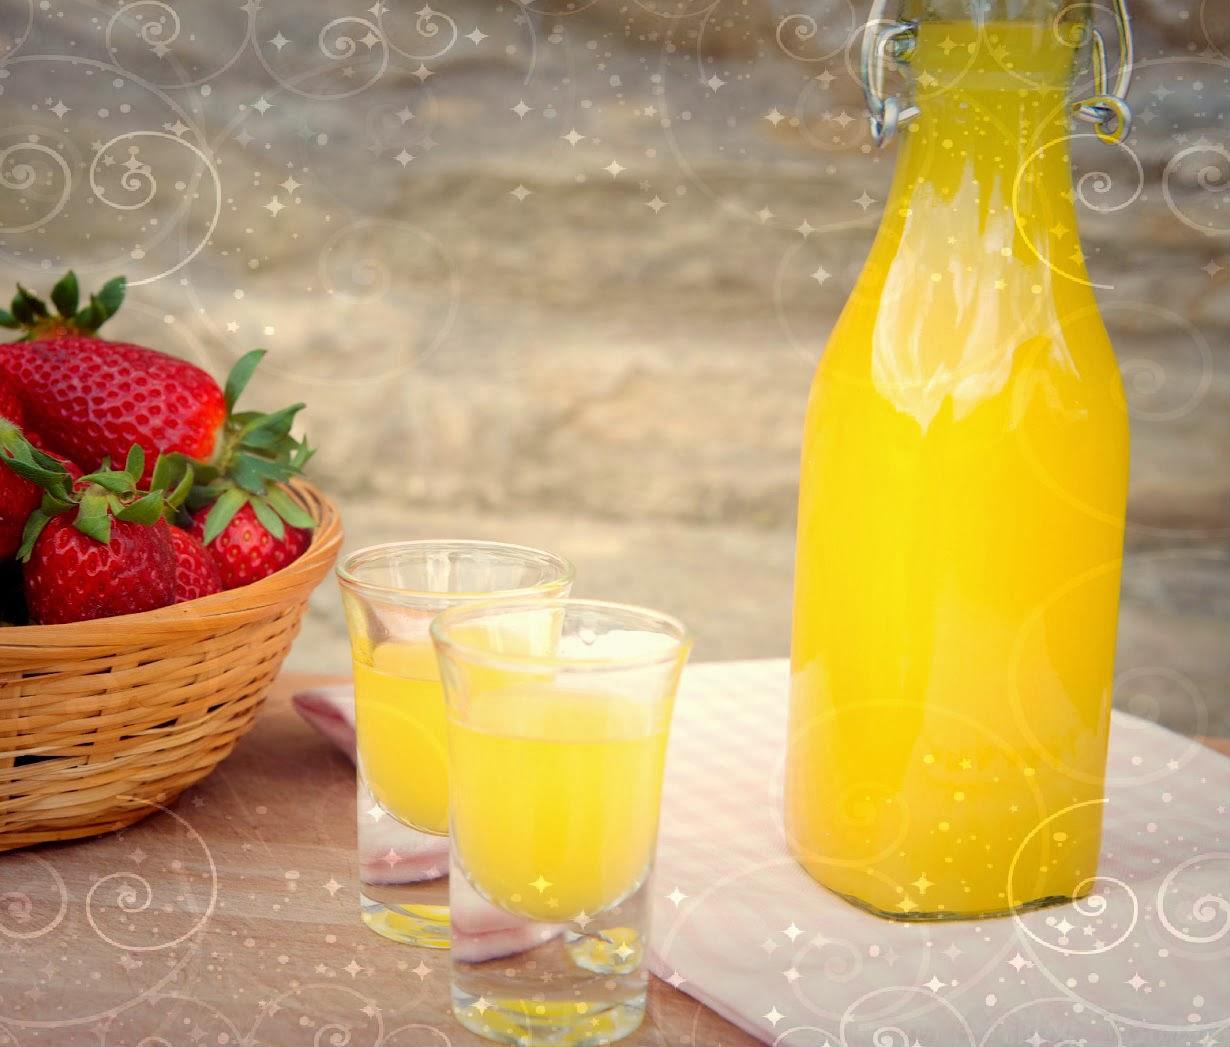 how to make limoncello using vodka